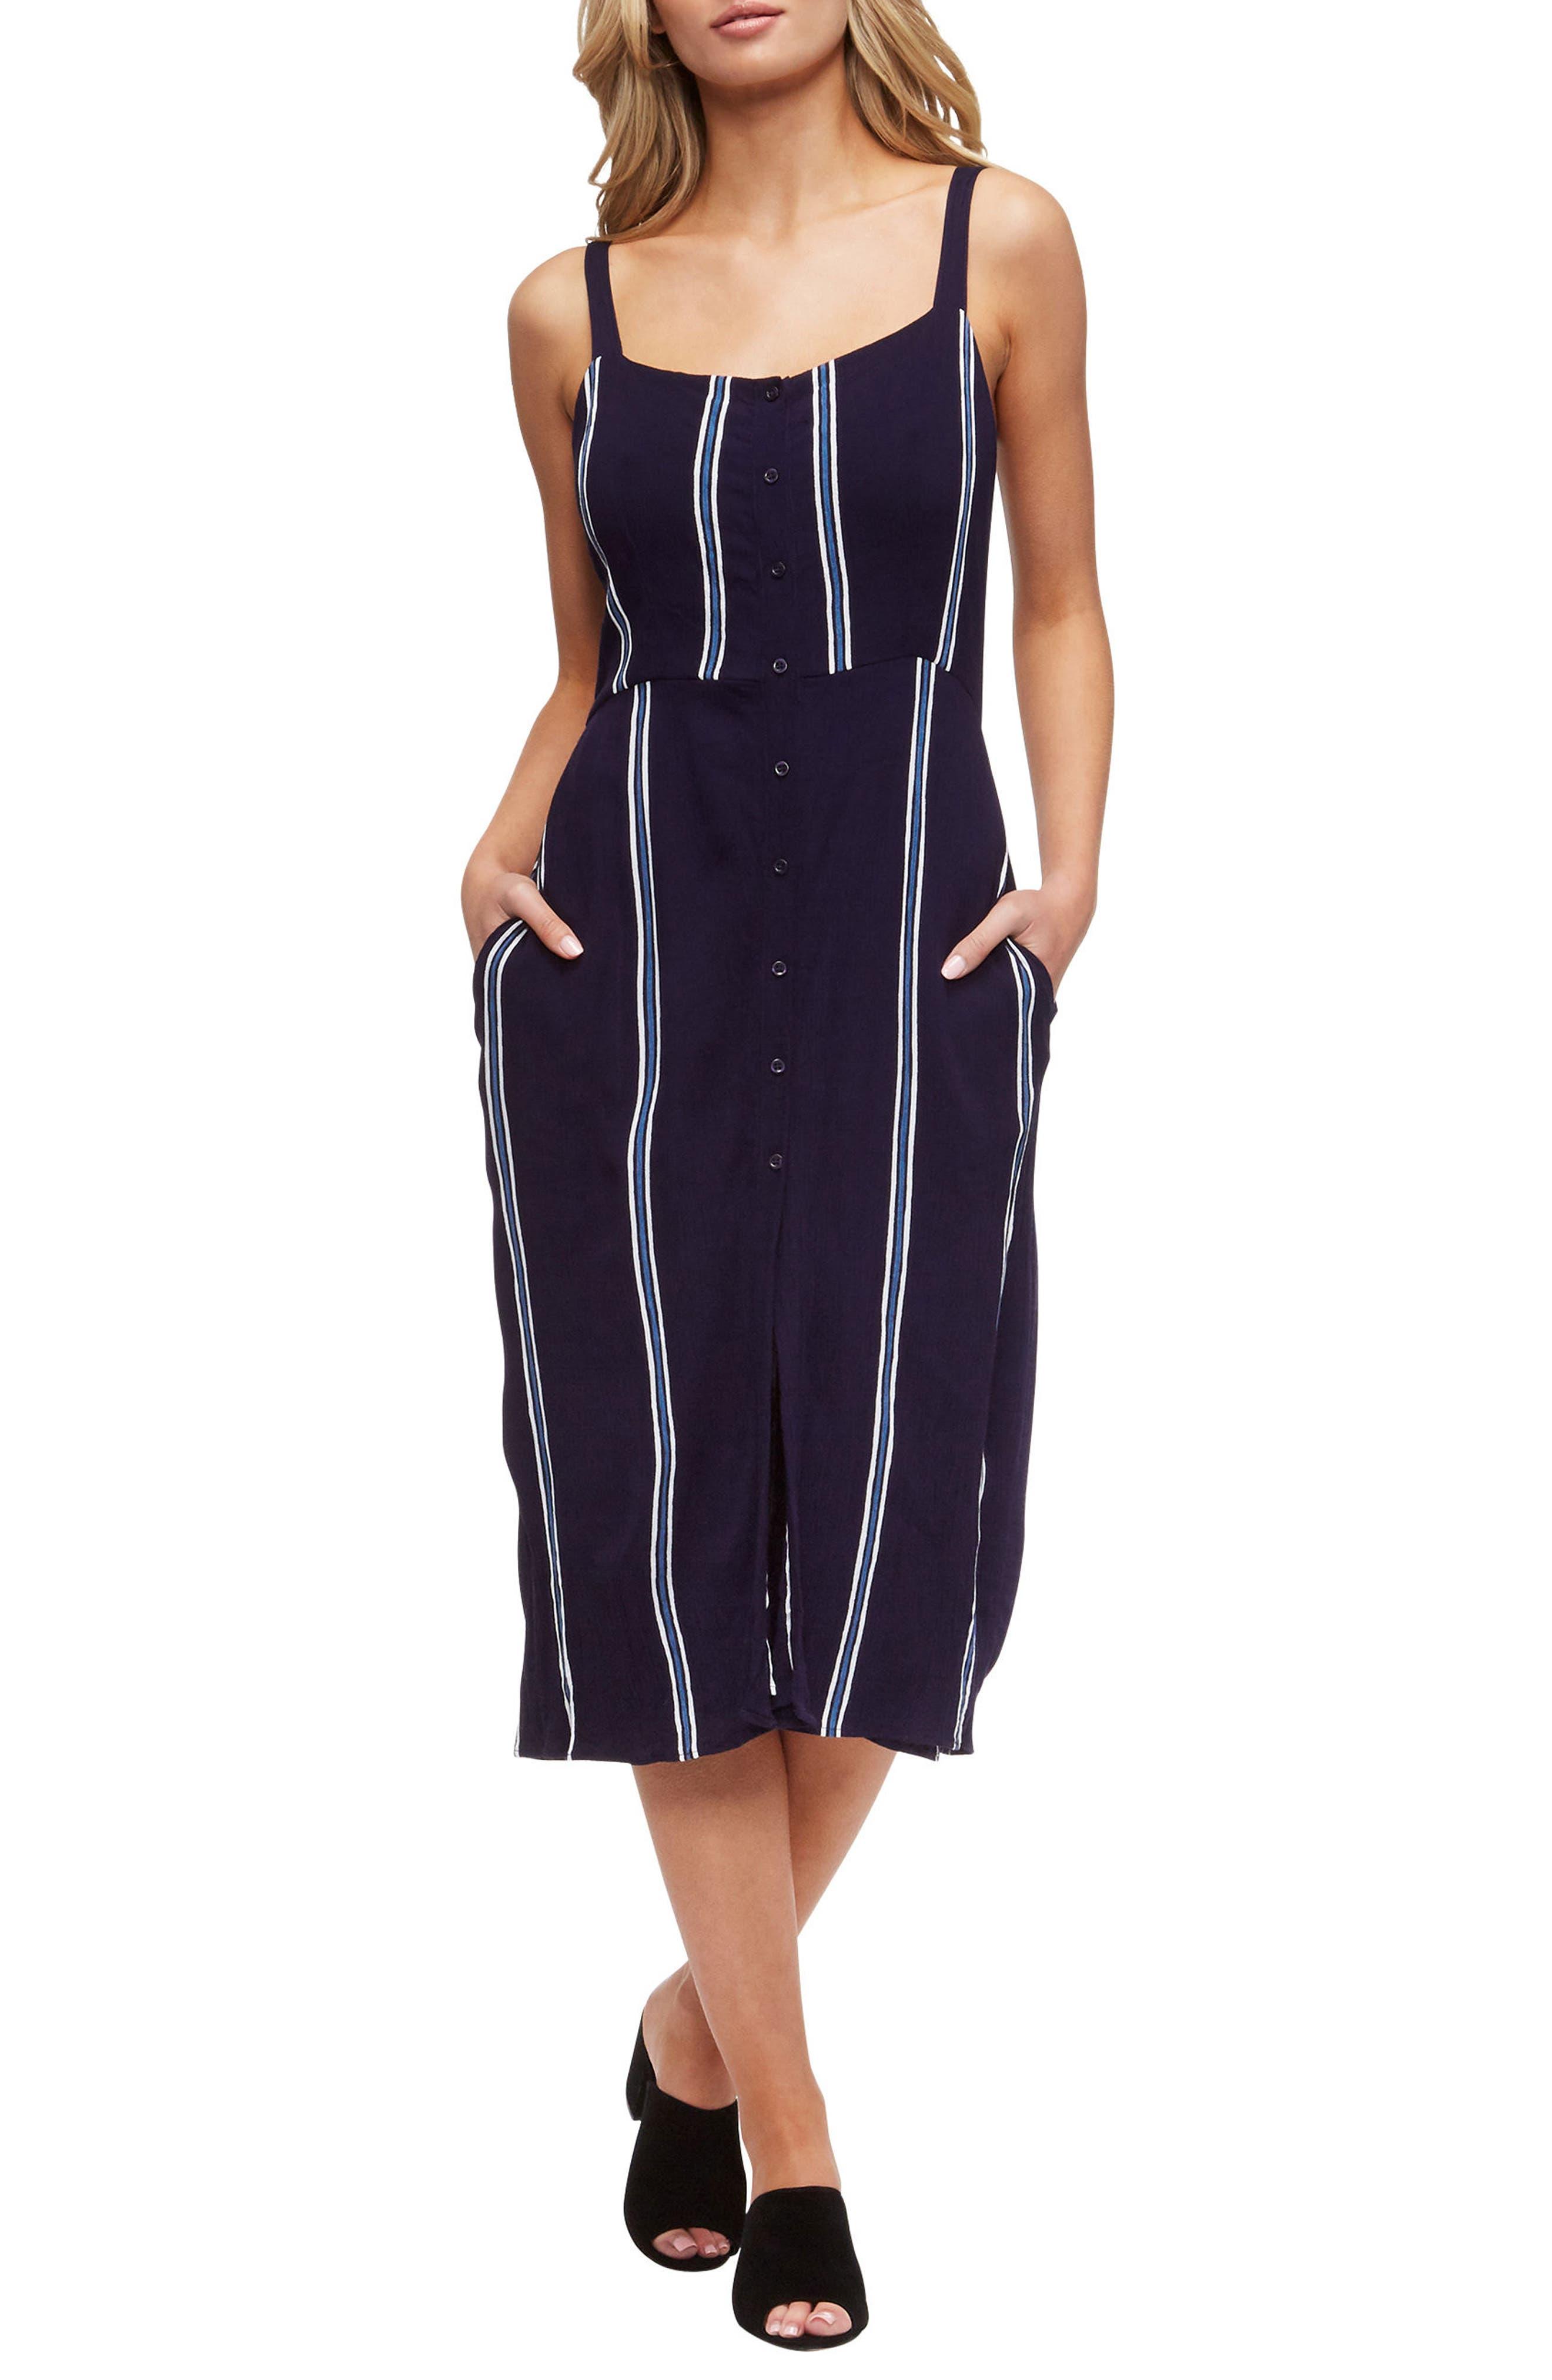 Geni Cover-Up Dress,                         Main,                         color, Evening Blue/White Stripe